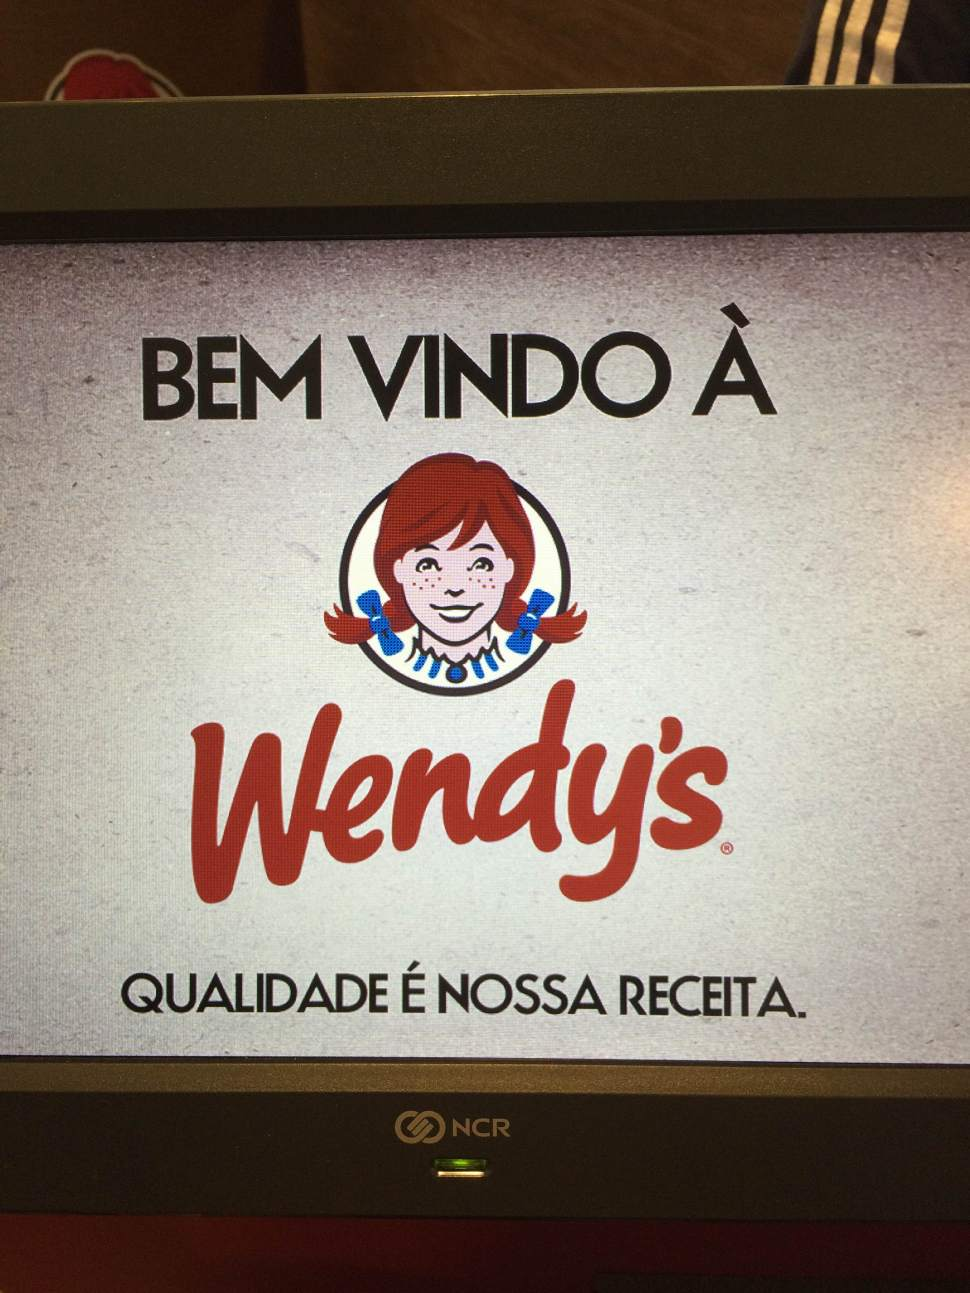 wendy's brasil endereço